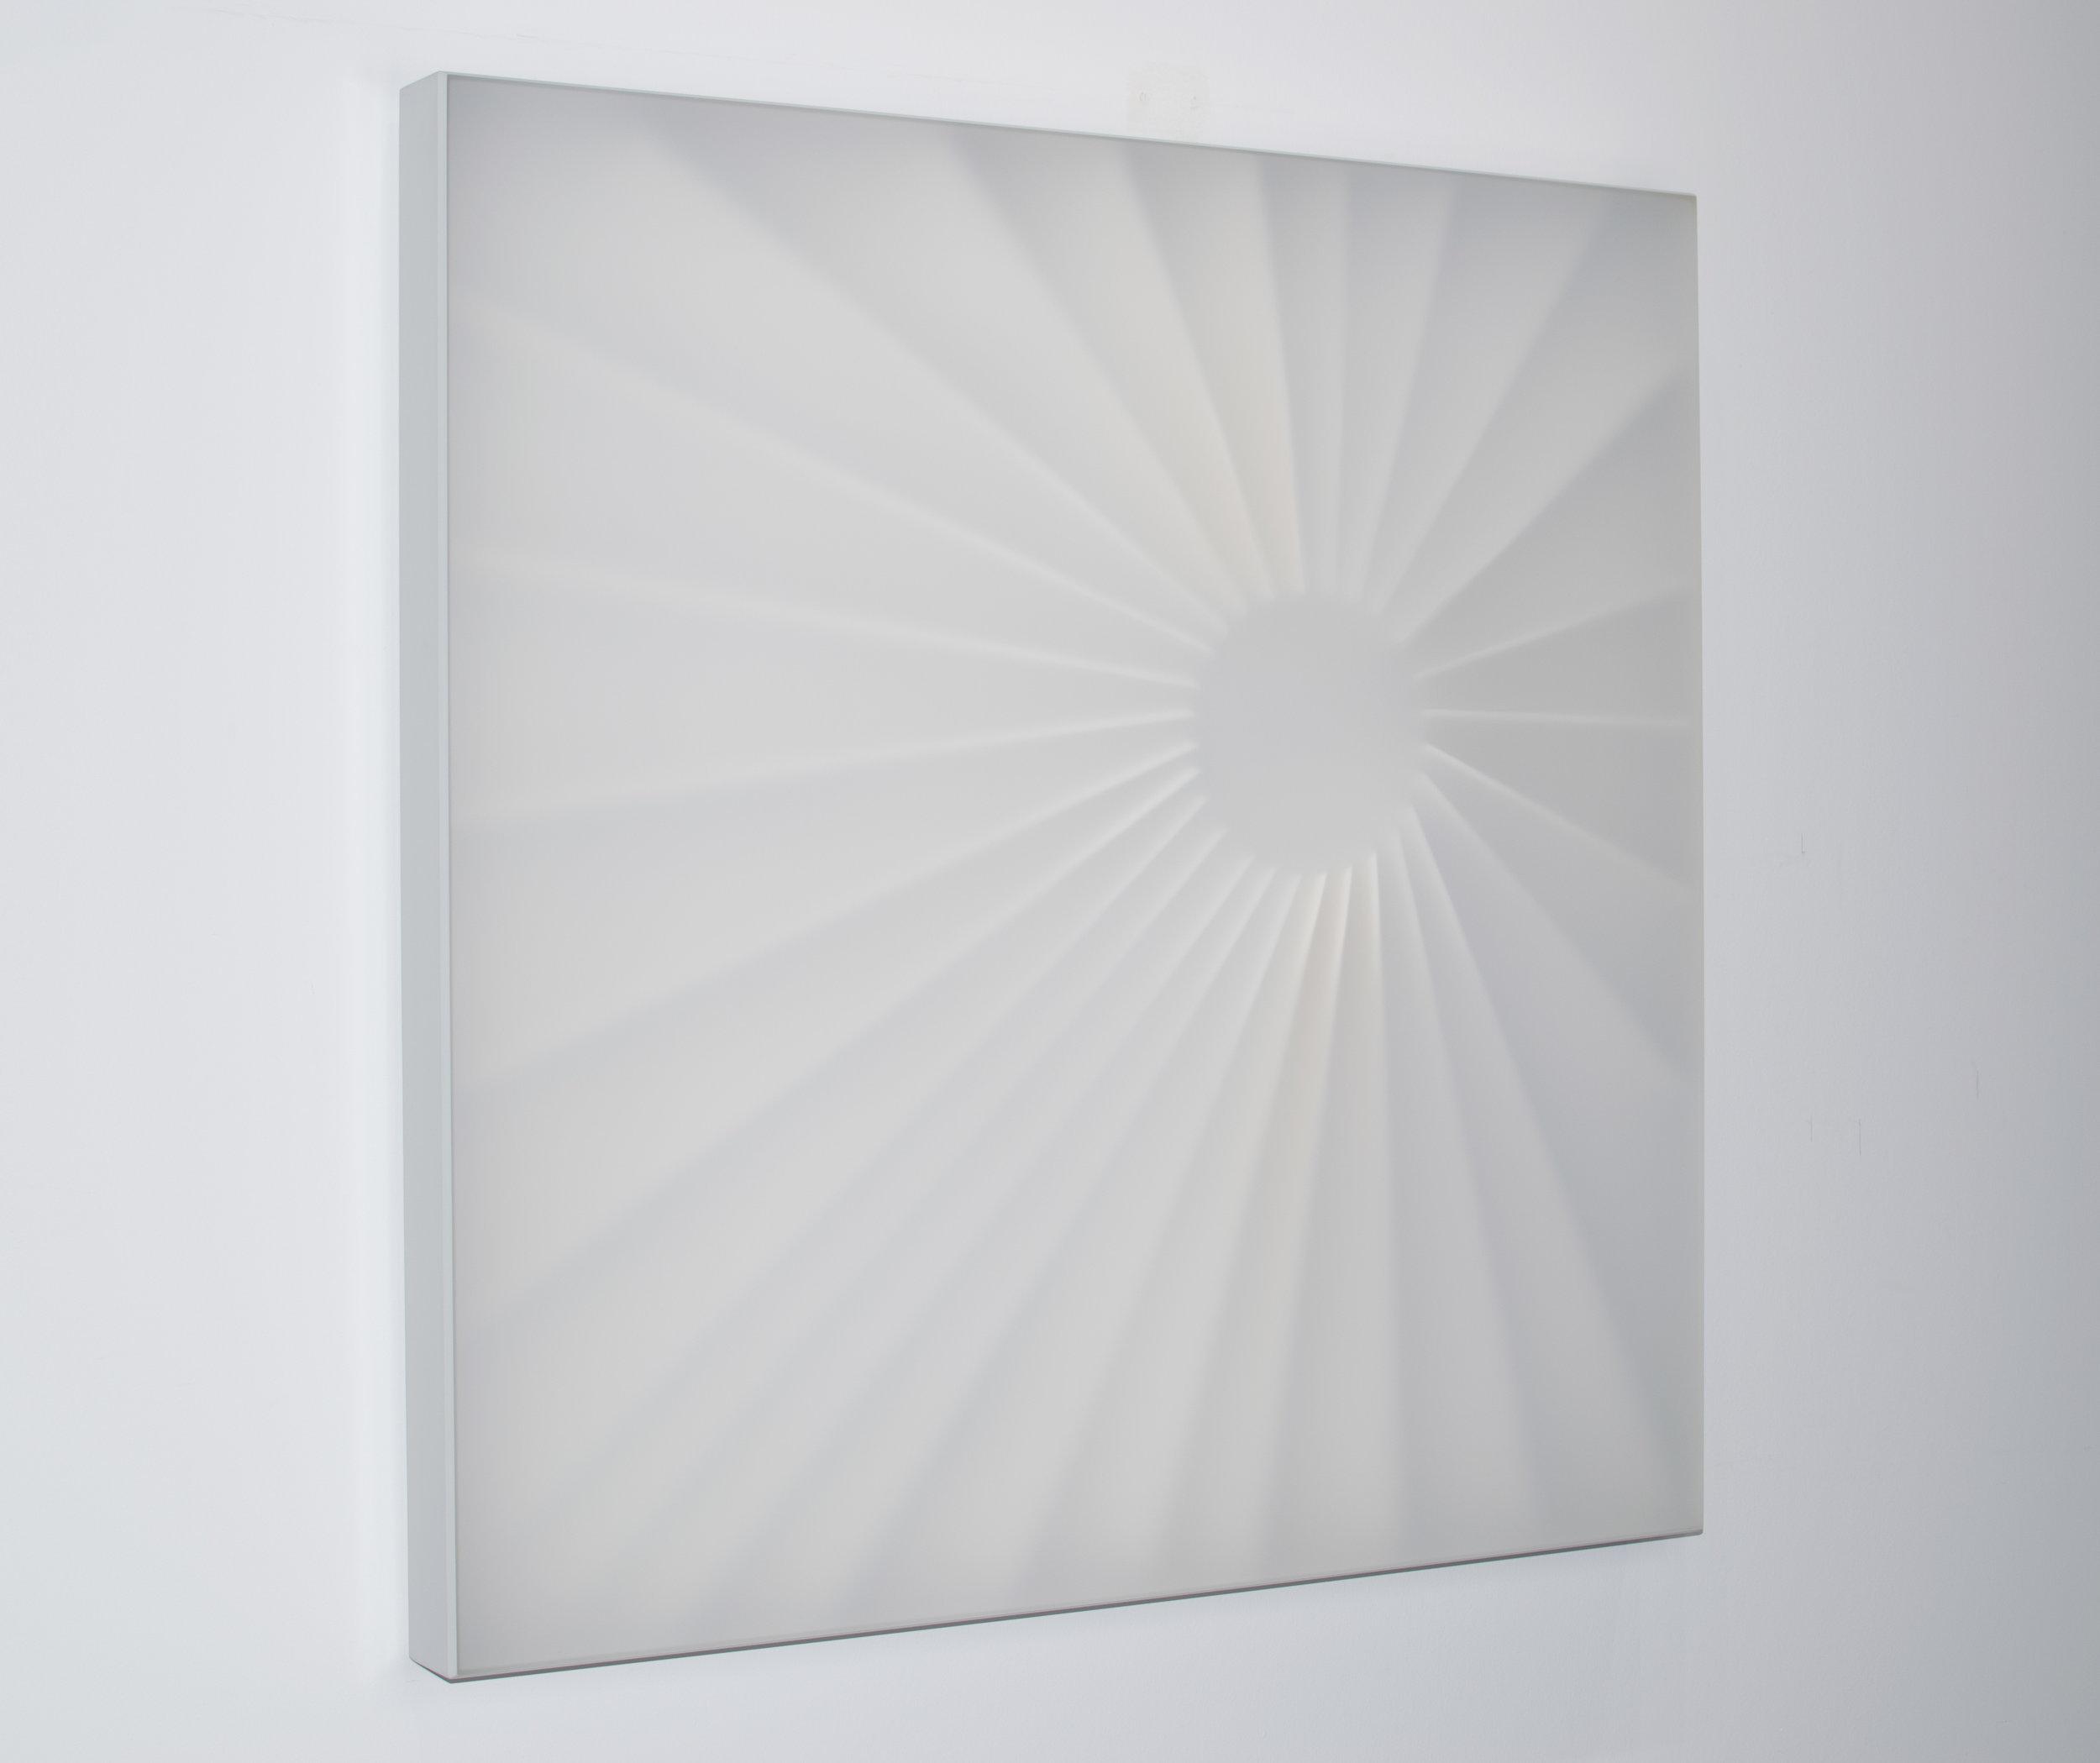 Untitled-32x32-Side.jpg